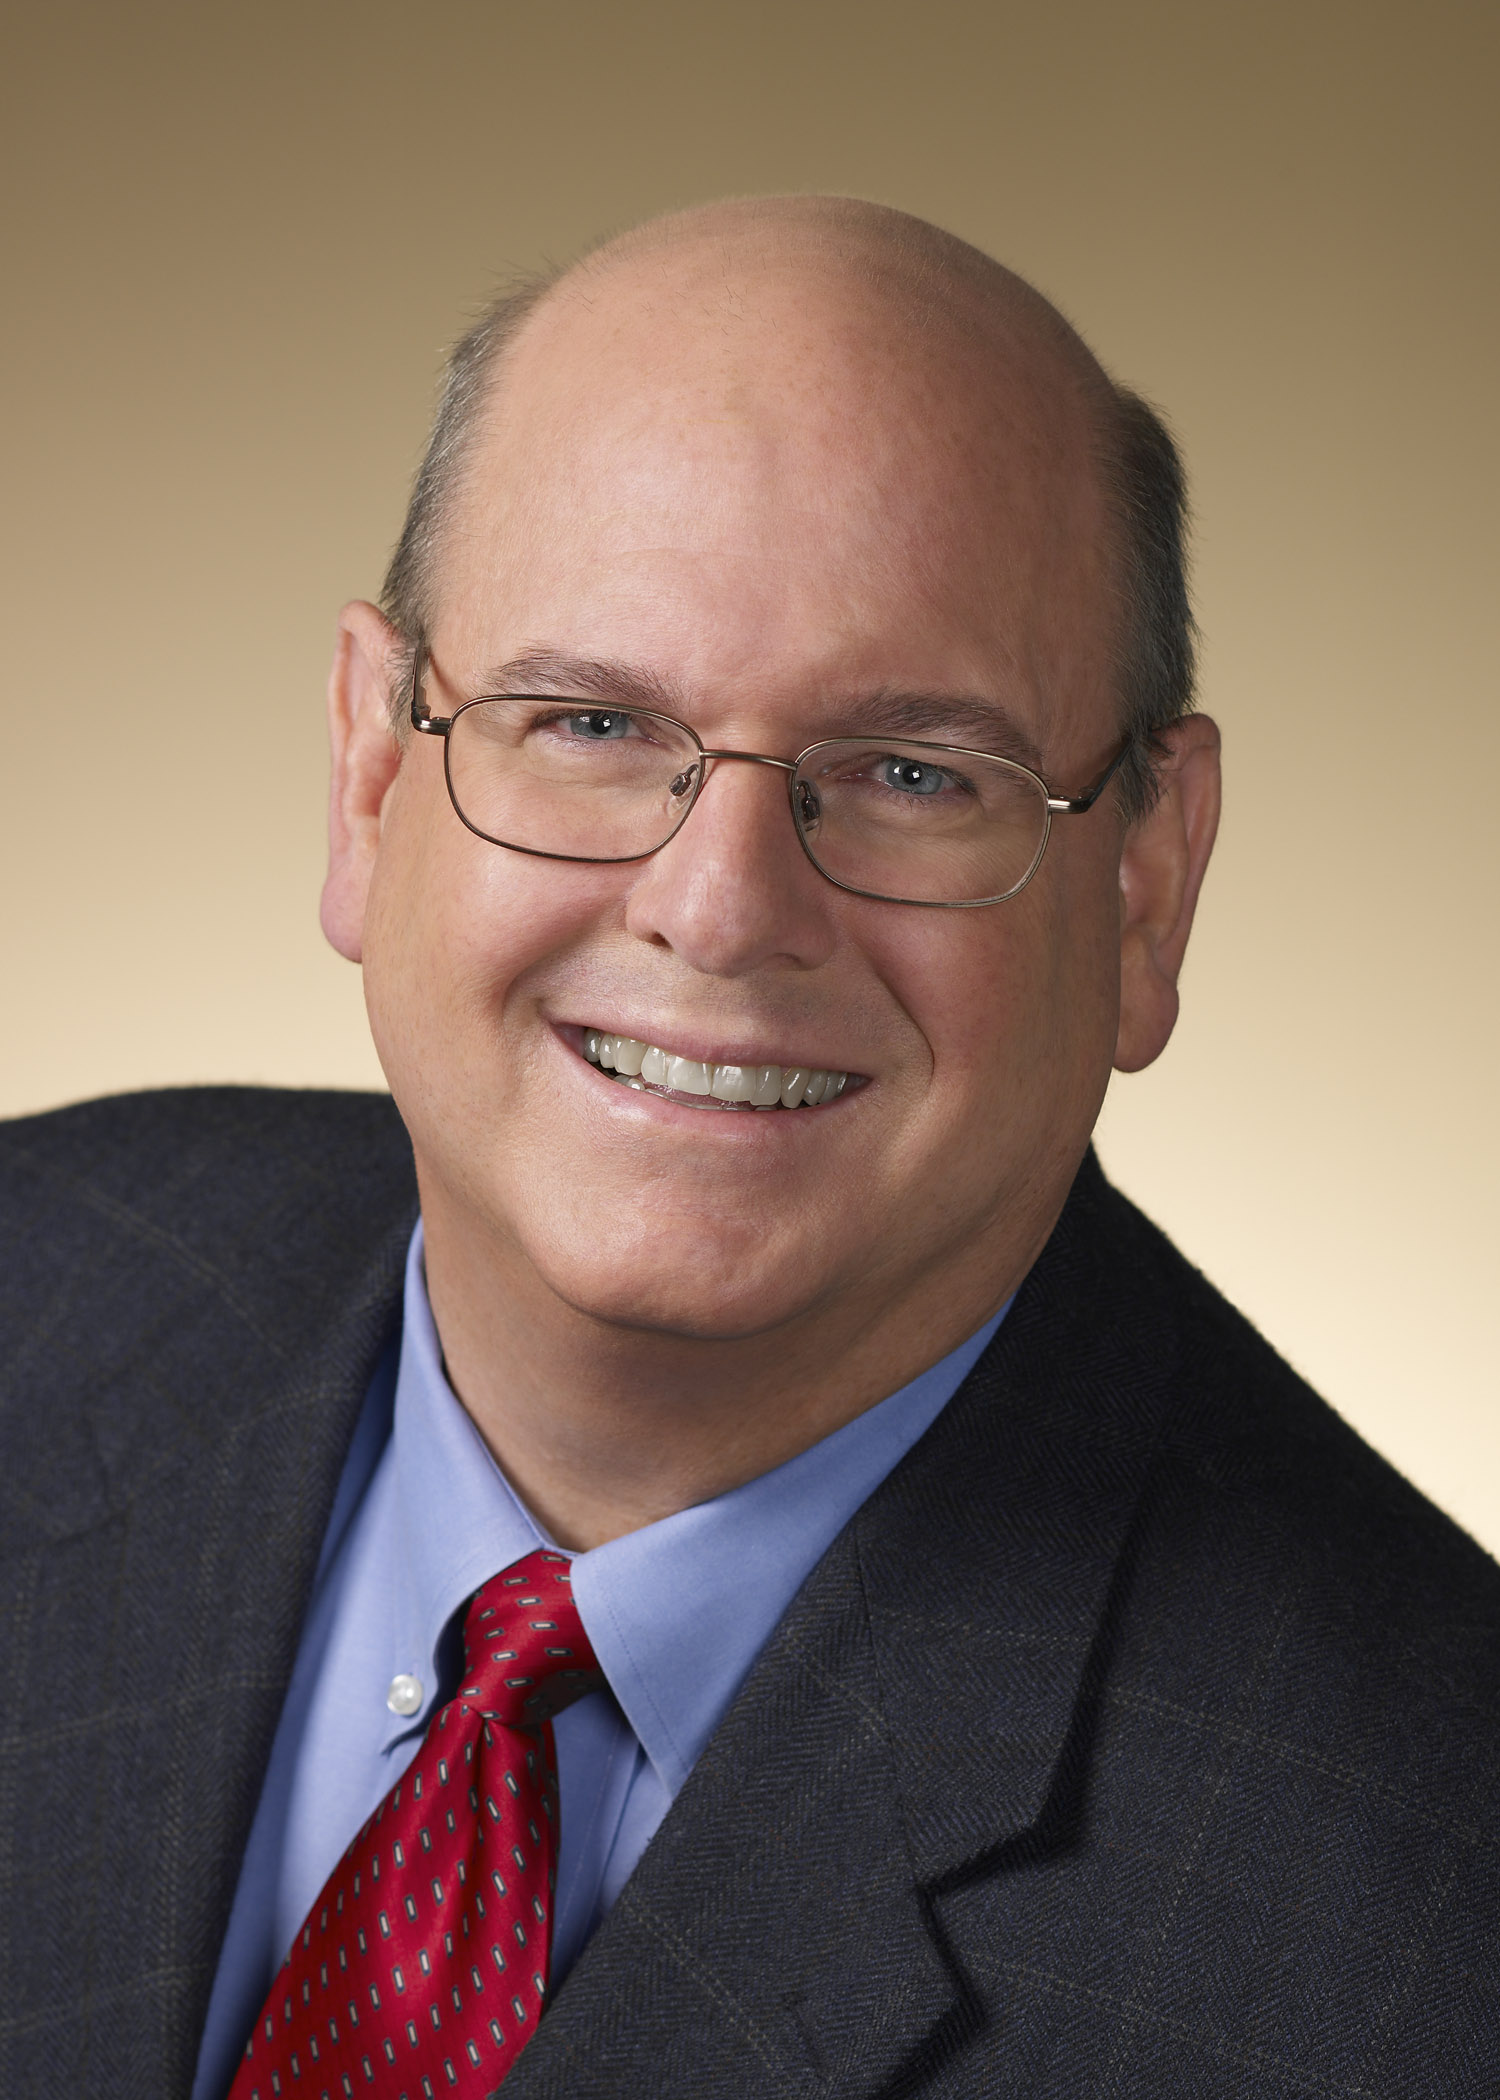 Christopher Ailman